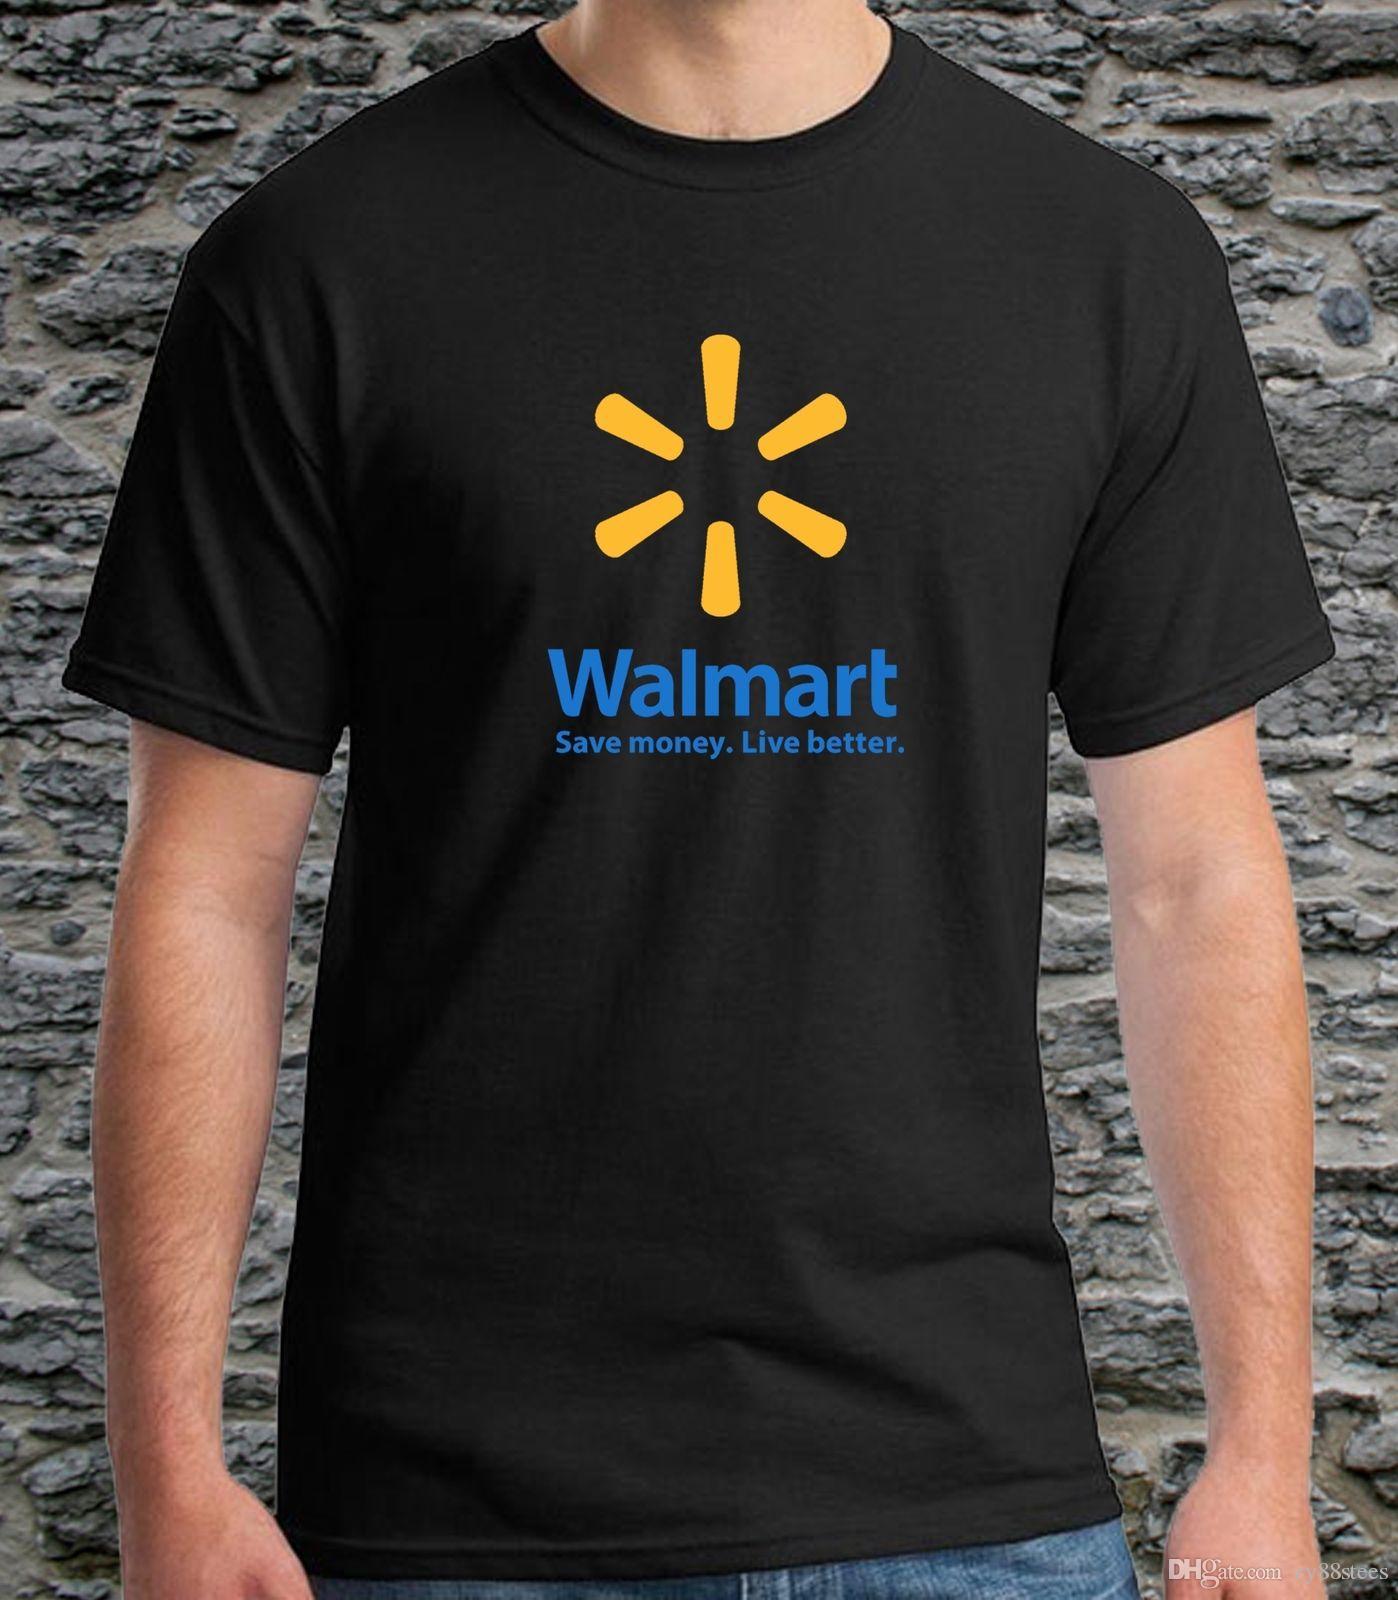 84ee3d5109256 Walmart Market Store Furniture Black T Shirt Grey Tee Men S S To 3Xl T Shirt  Men Boy Casual Custom Short Sleeve XXXL Group Tshirt Cool Looking T Shirts  Buy ...